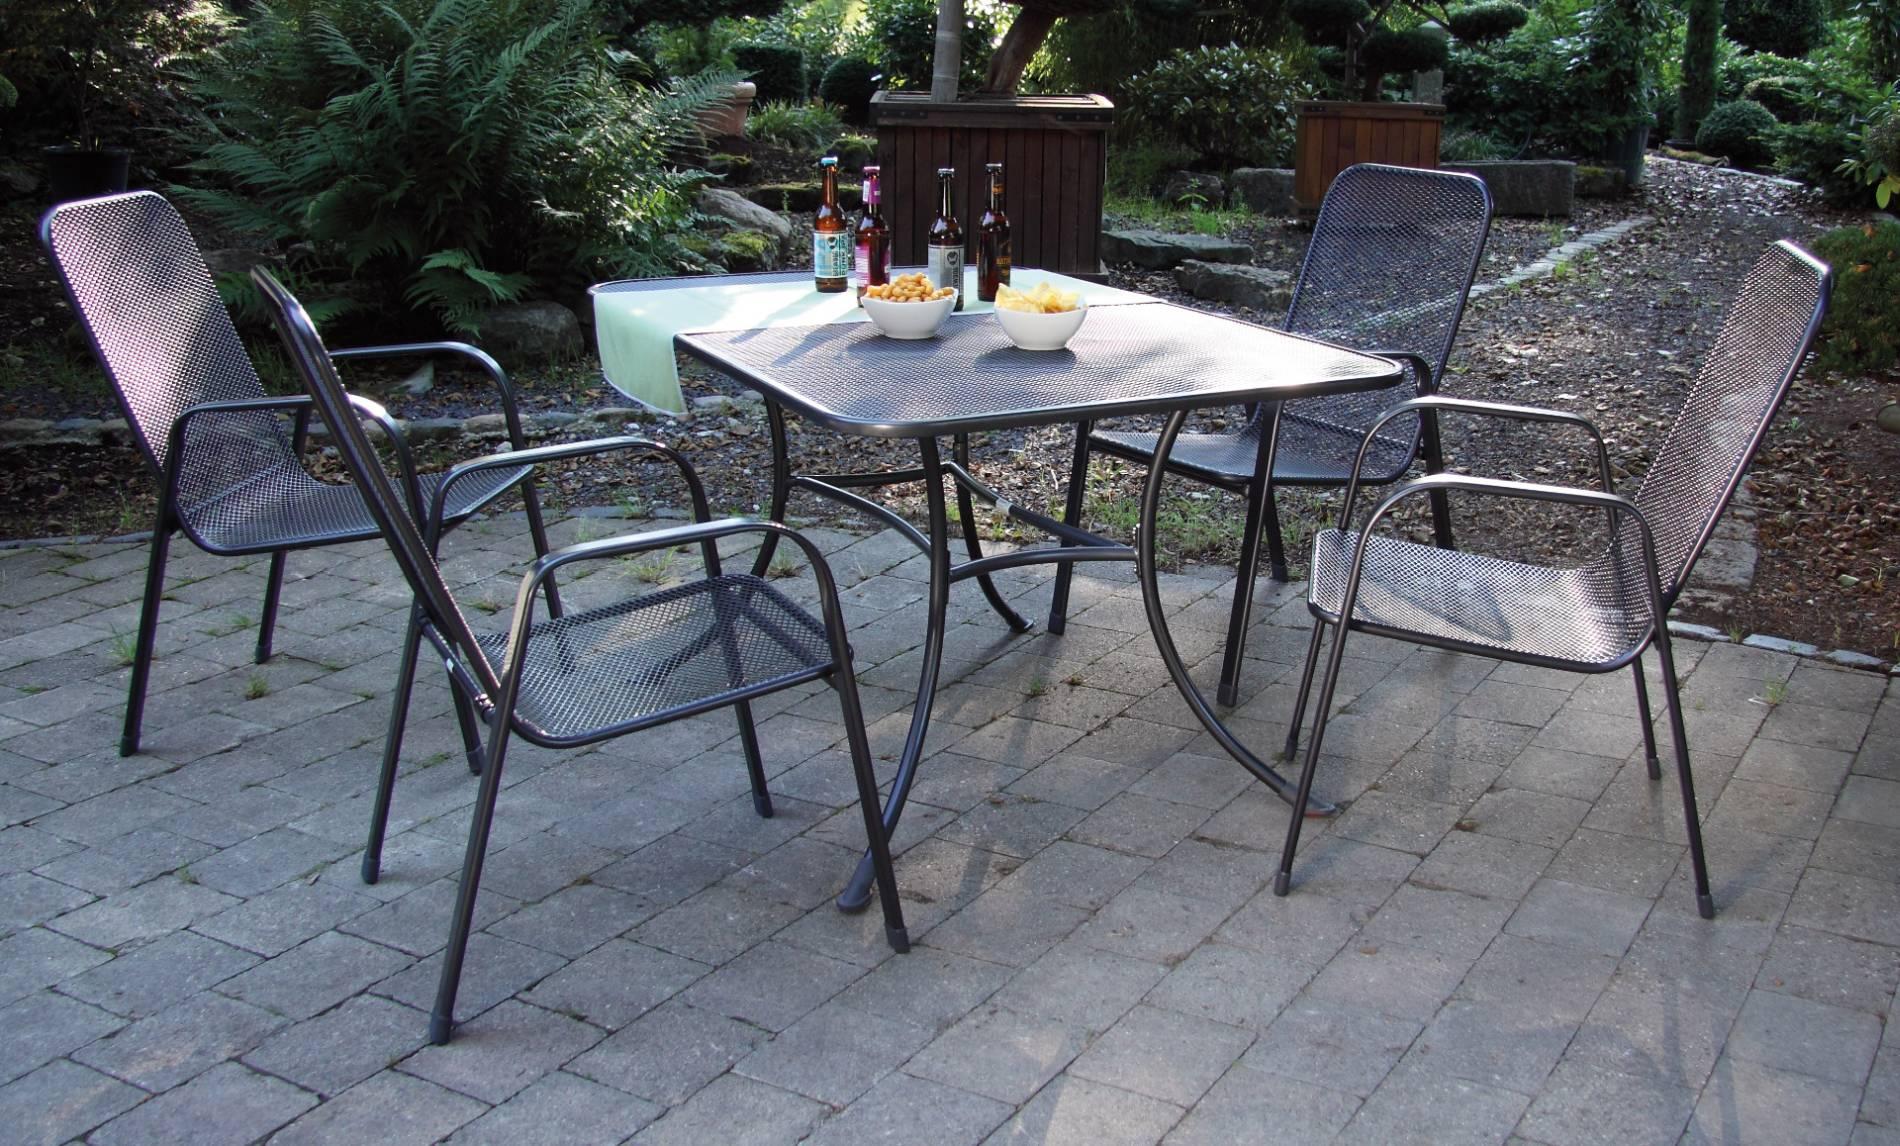 acamp Gartenmöbelset Streckmetall 4x Astor Stapelsessel 56451 und 1x Tisch Strada 145 x 90 cm